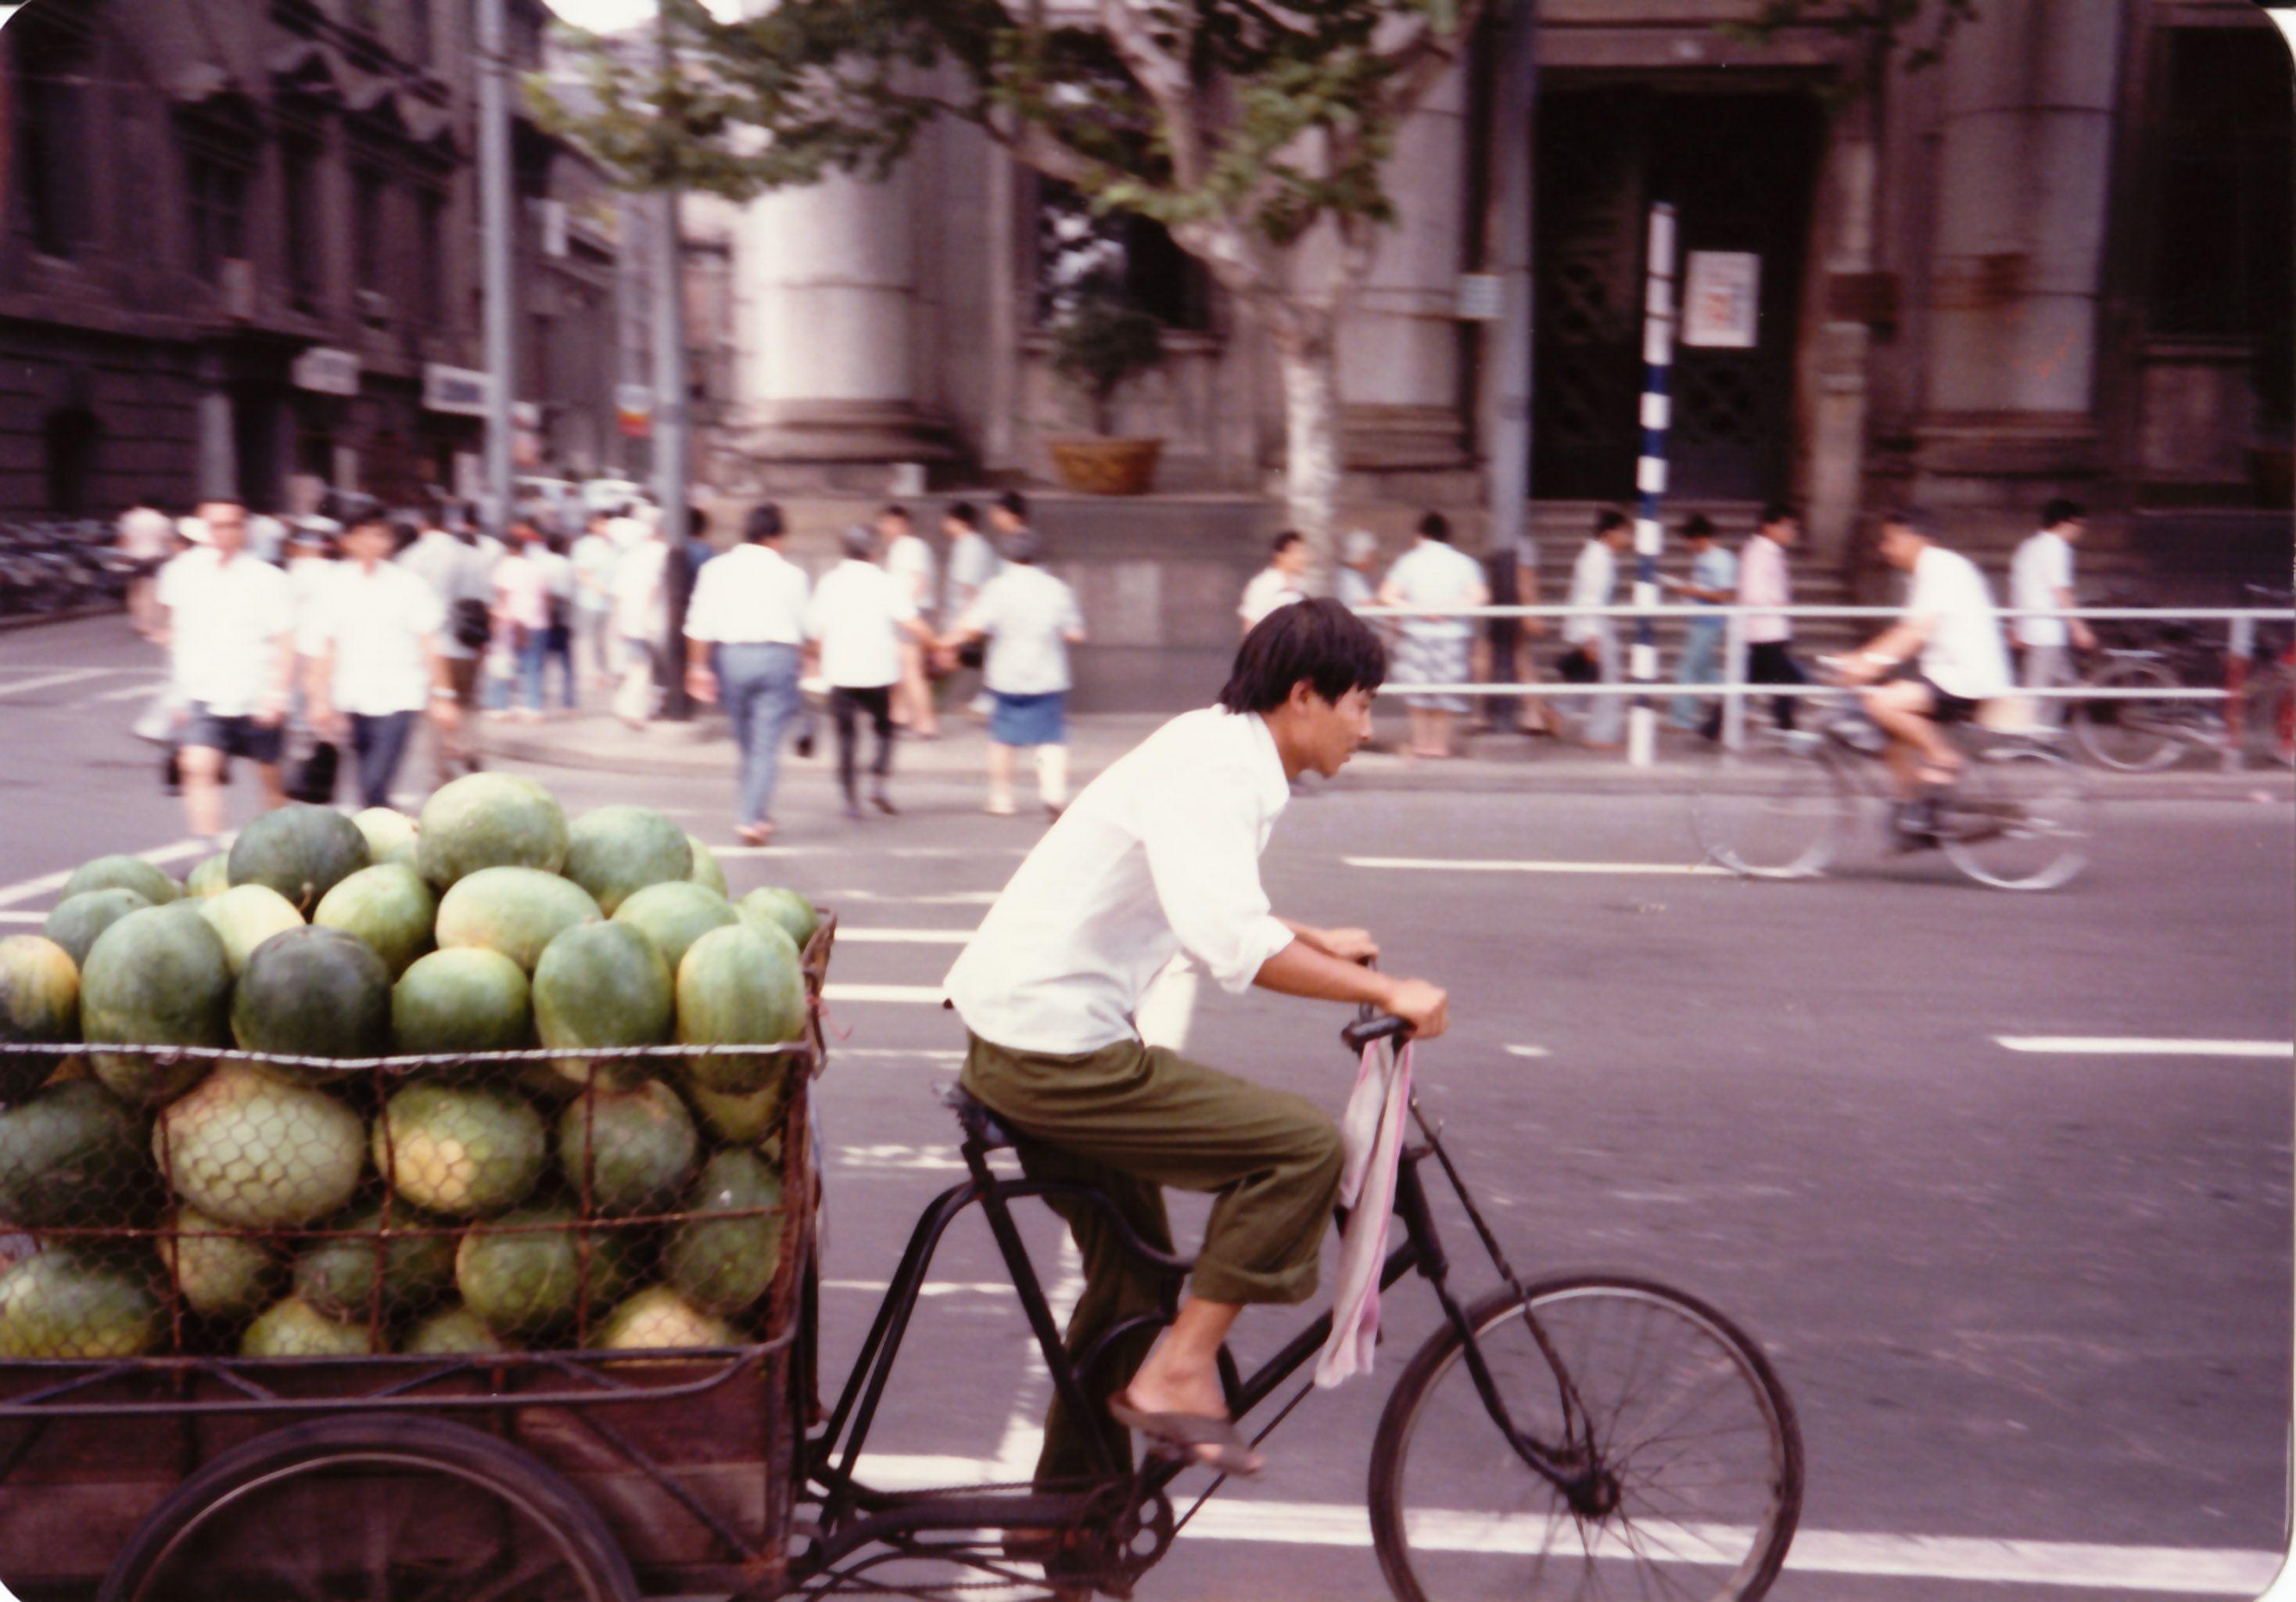 Melons to market. Beijing.